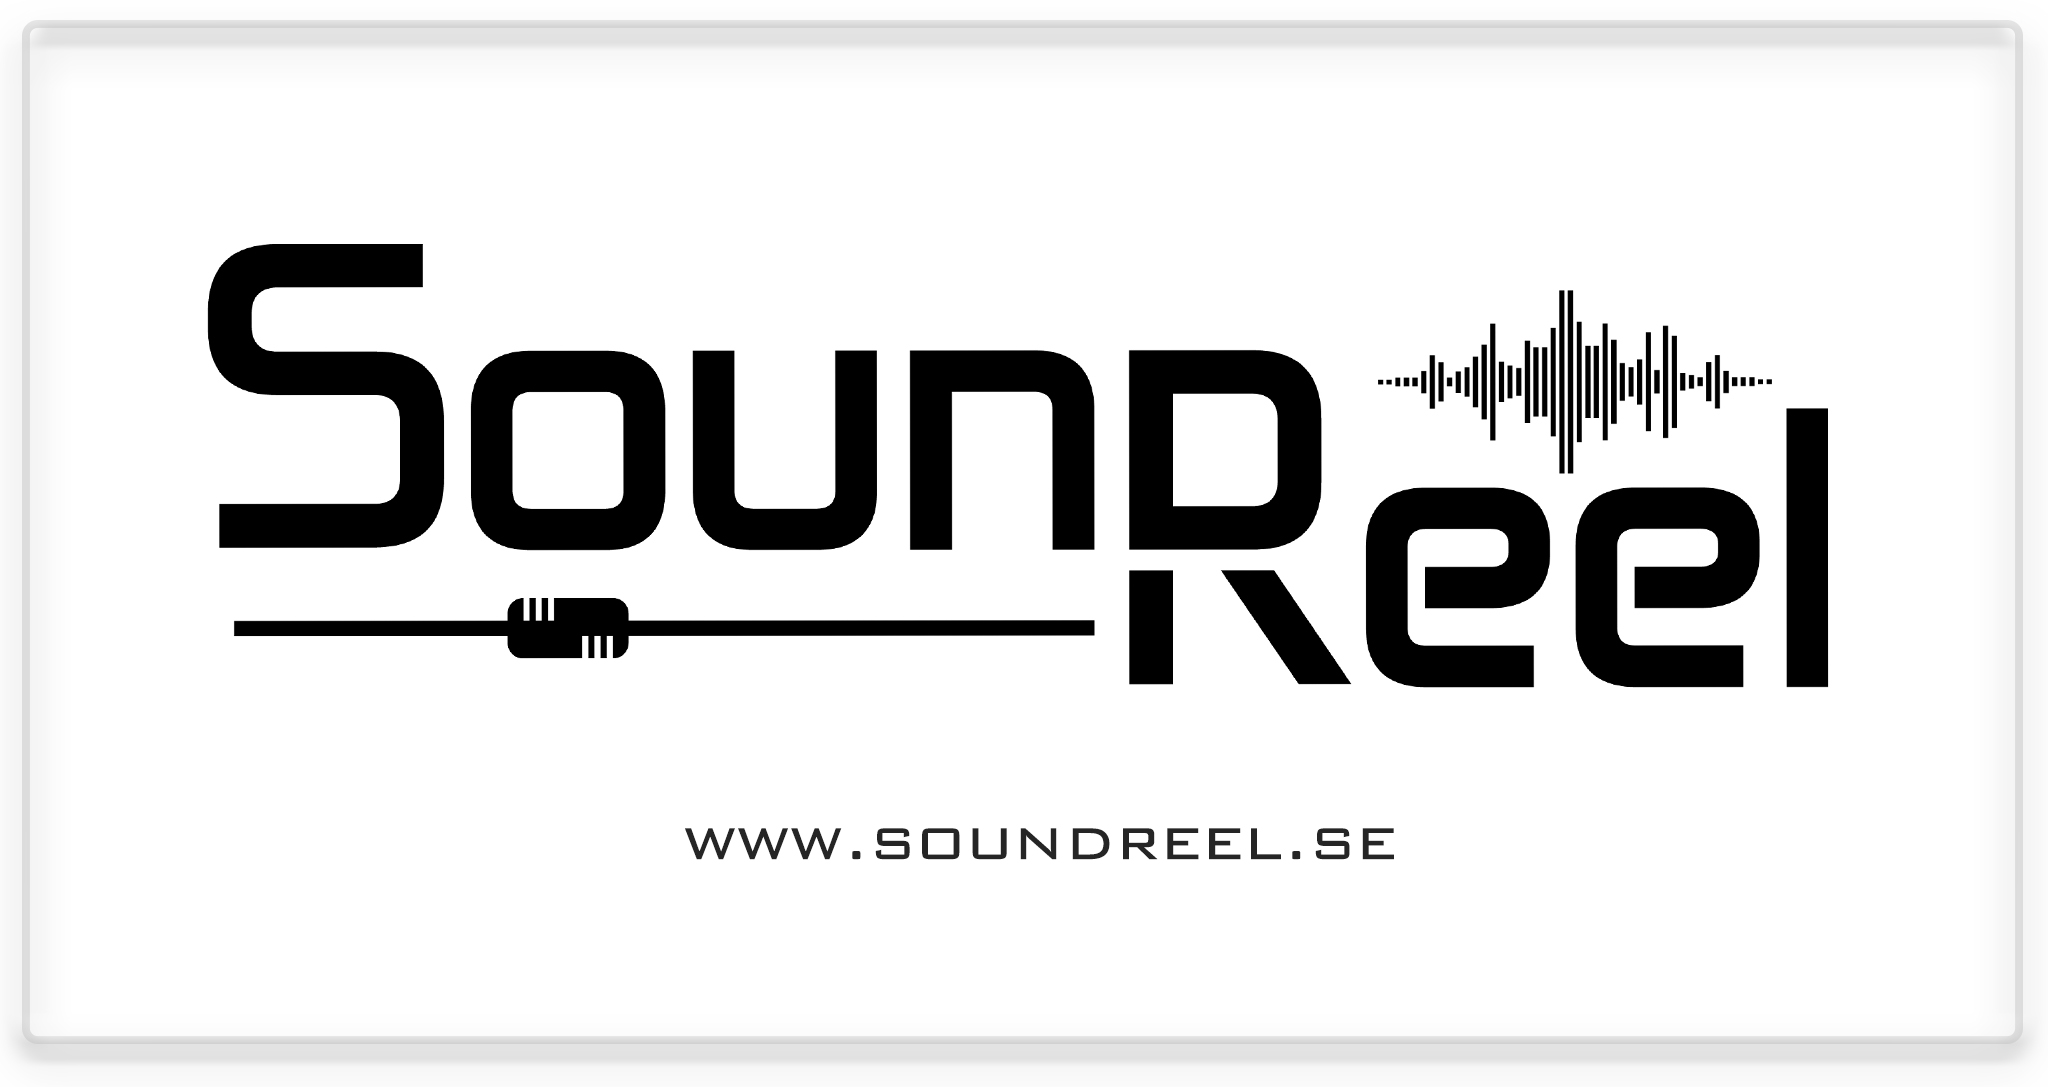 Soundreel